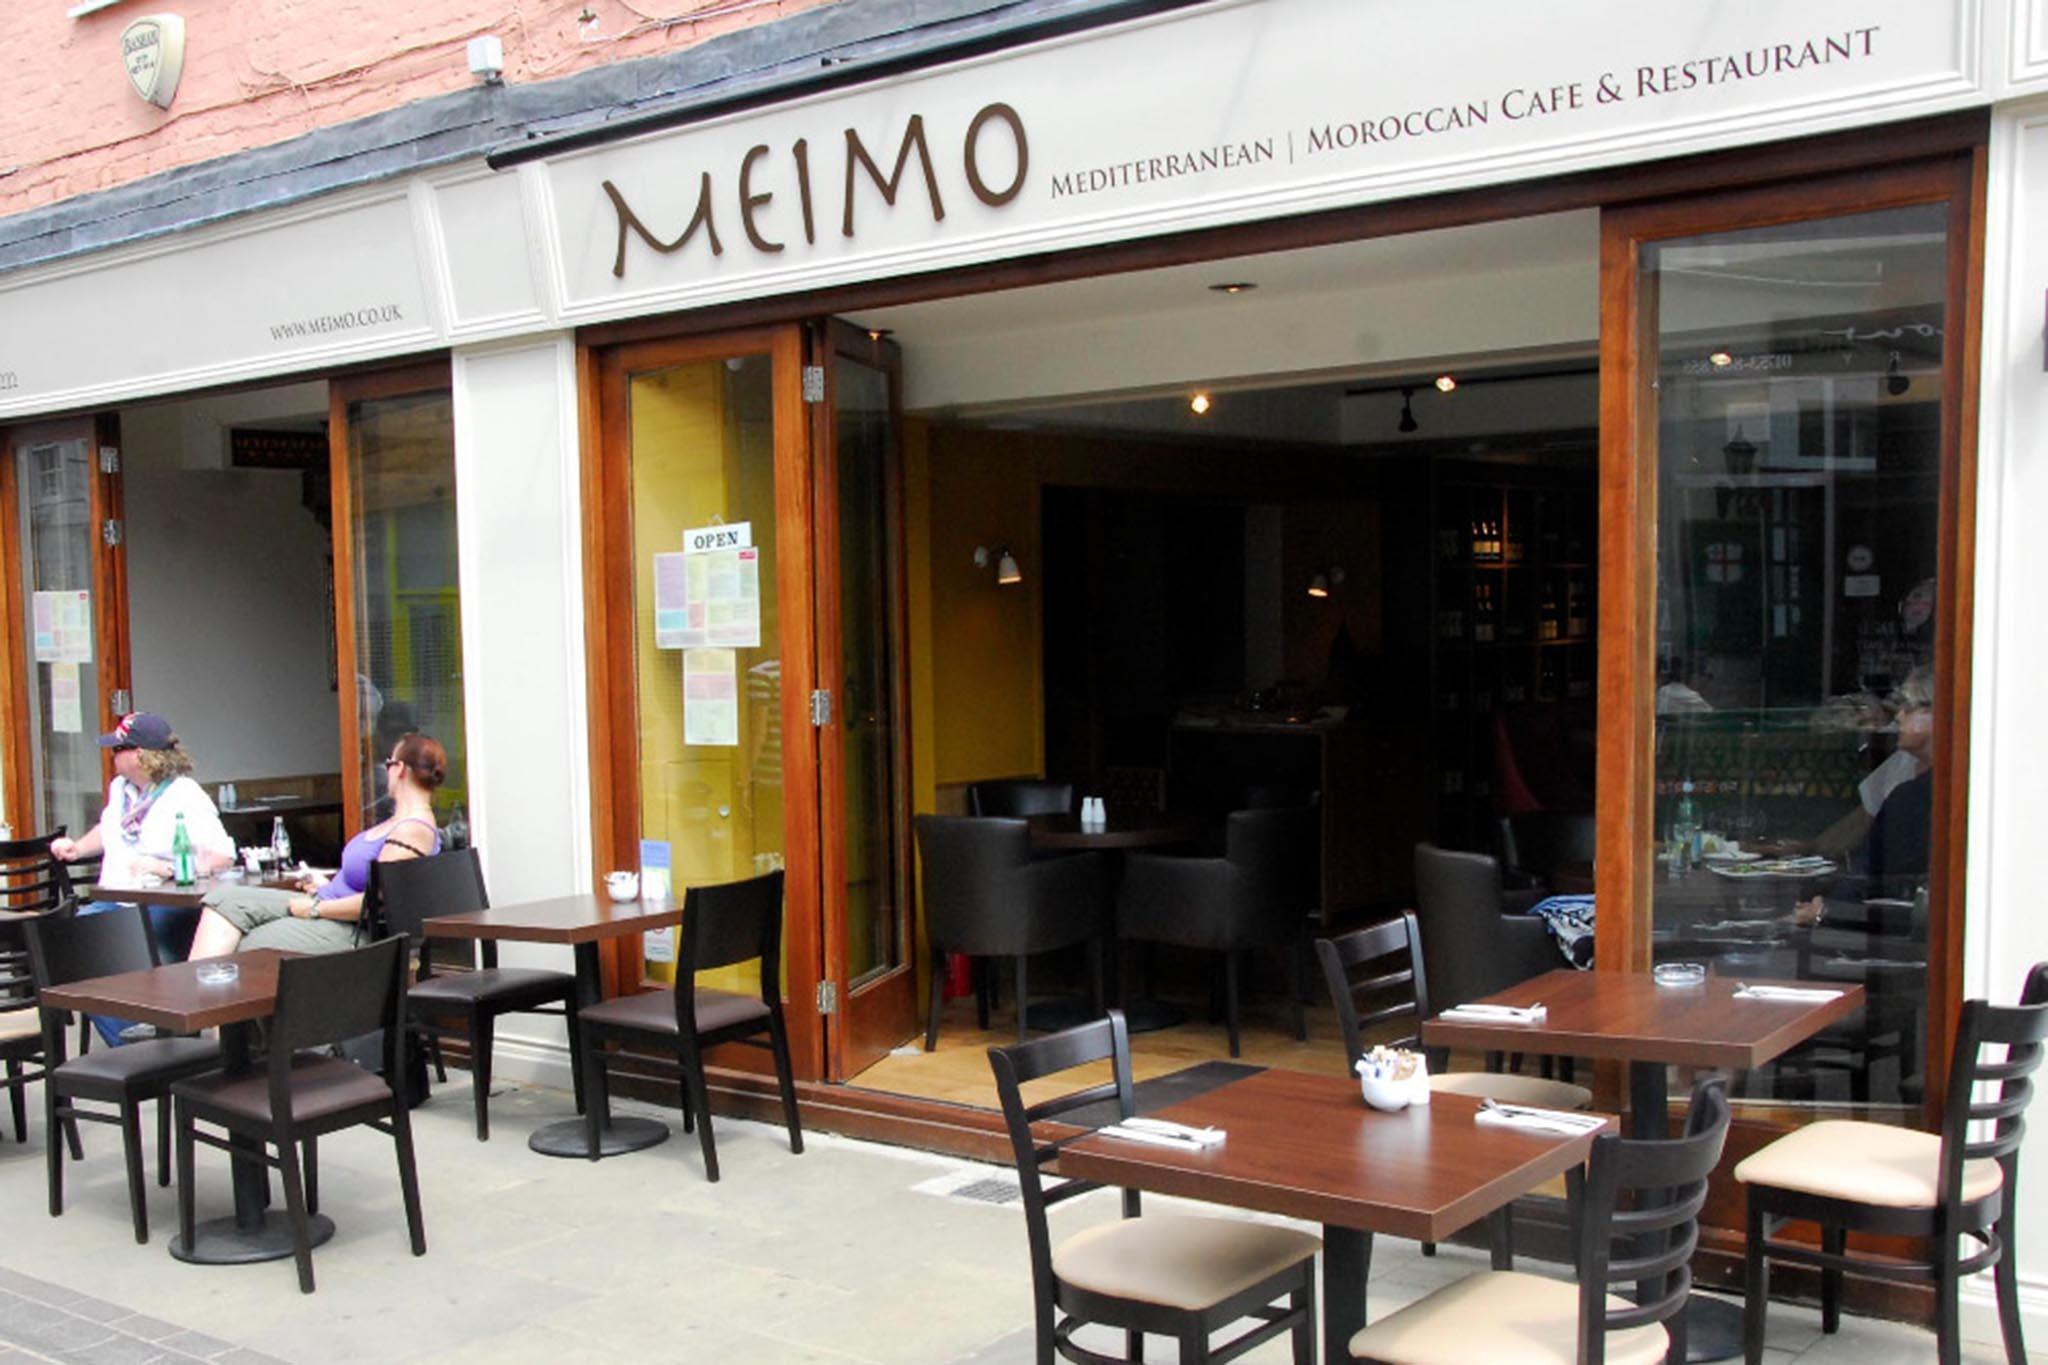 Meimo Eitw